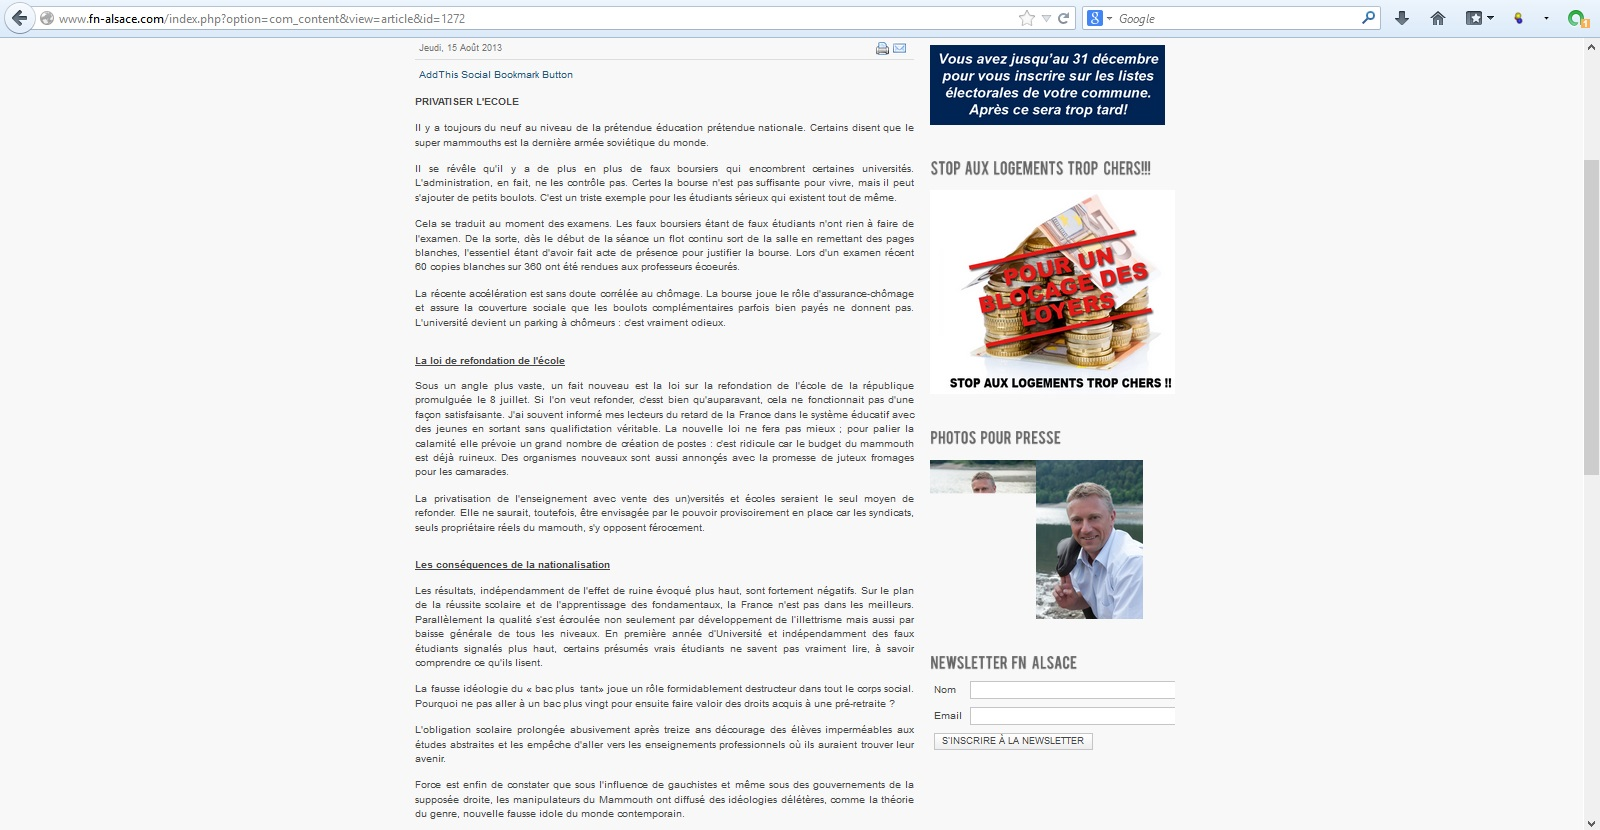 FN_Theorie_du_genre-Alsace